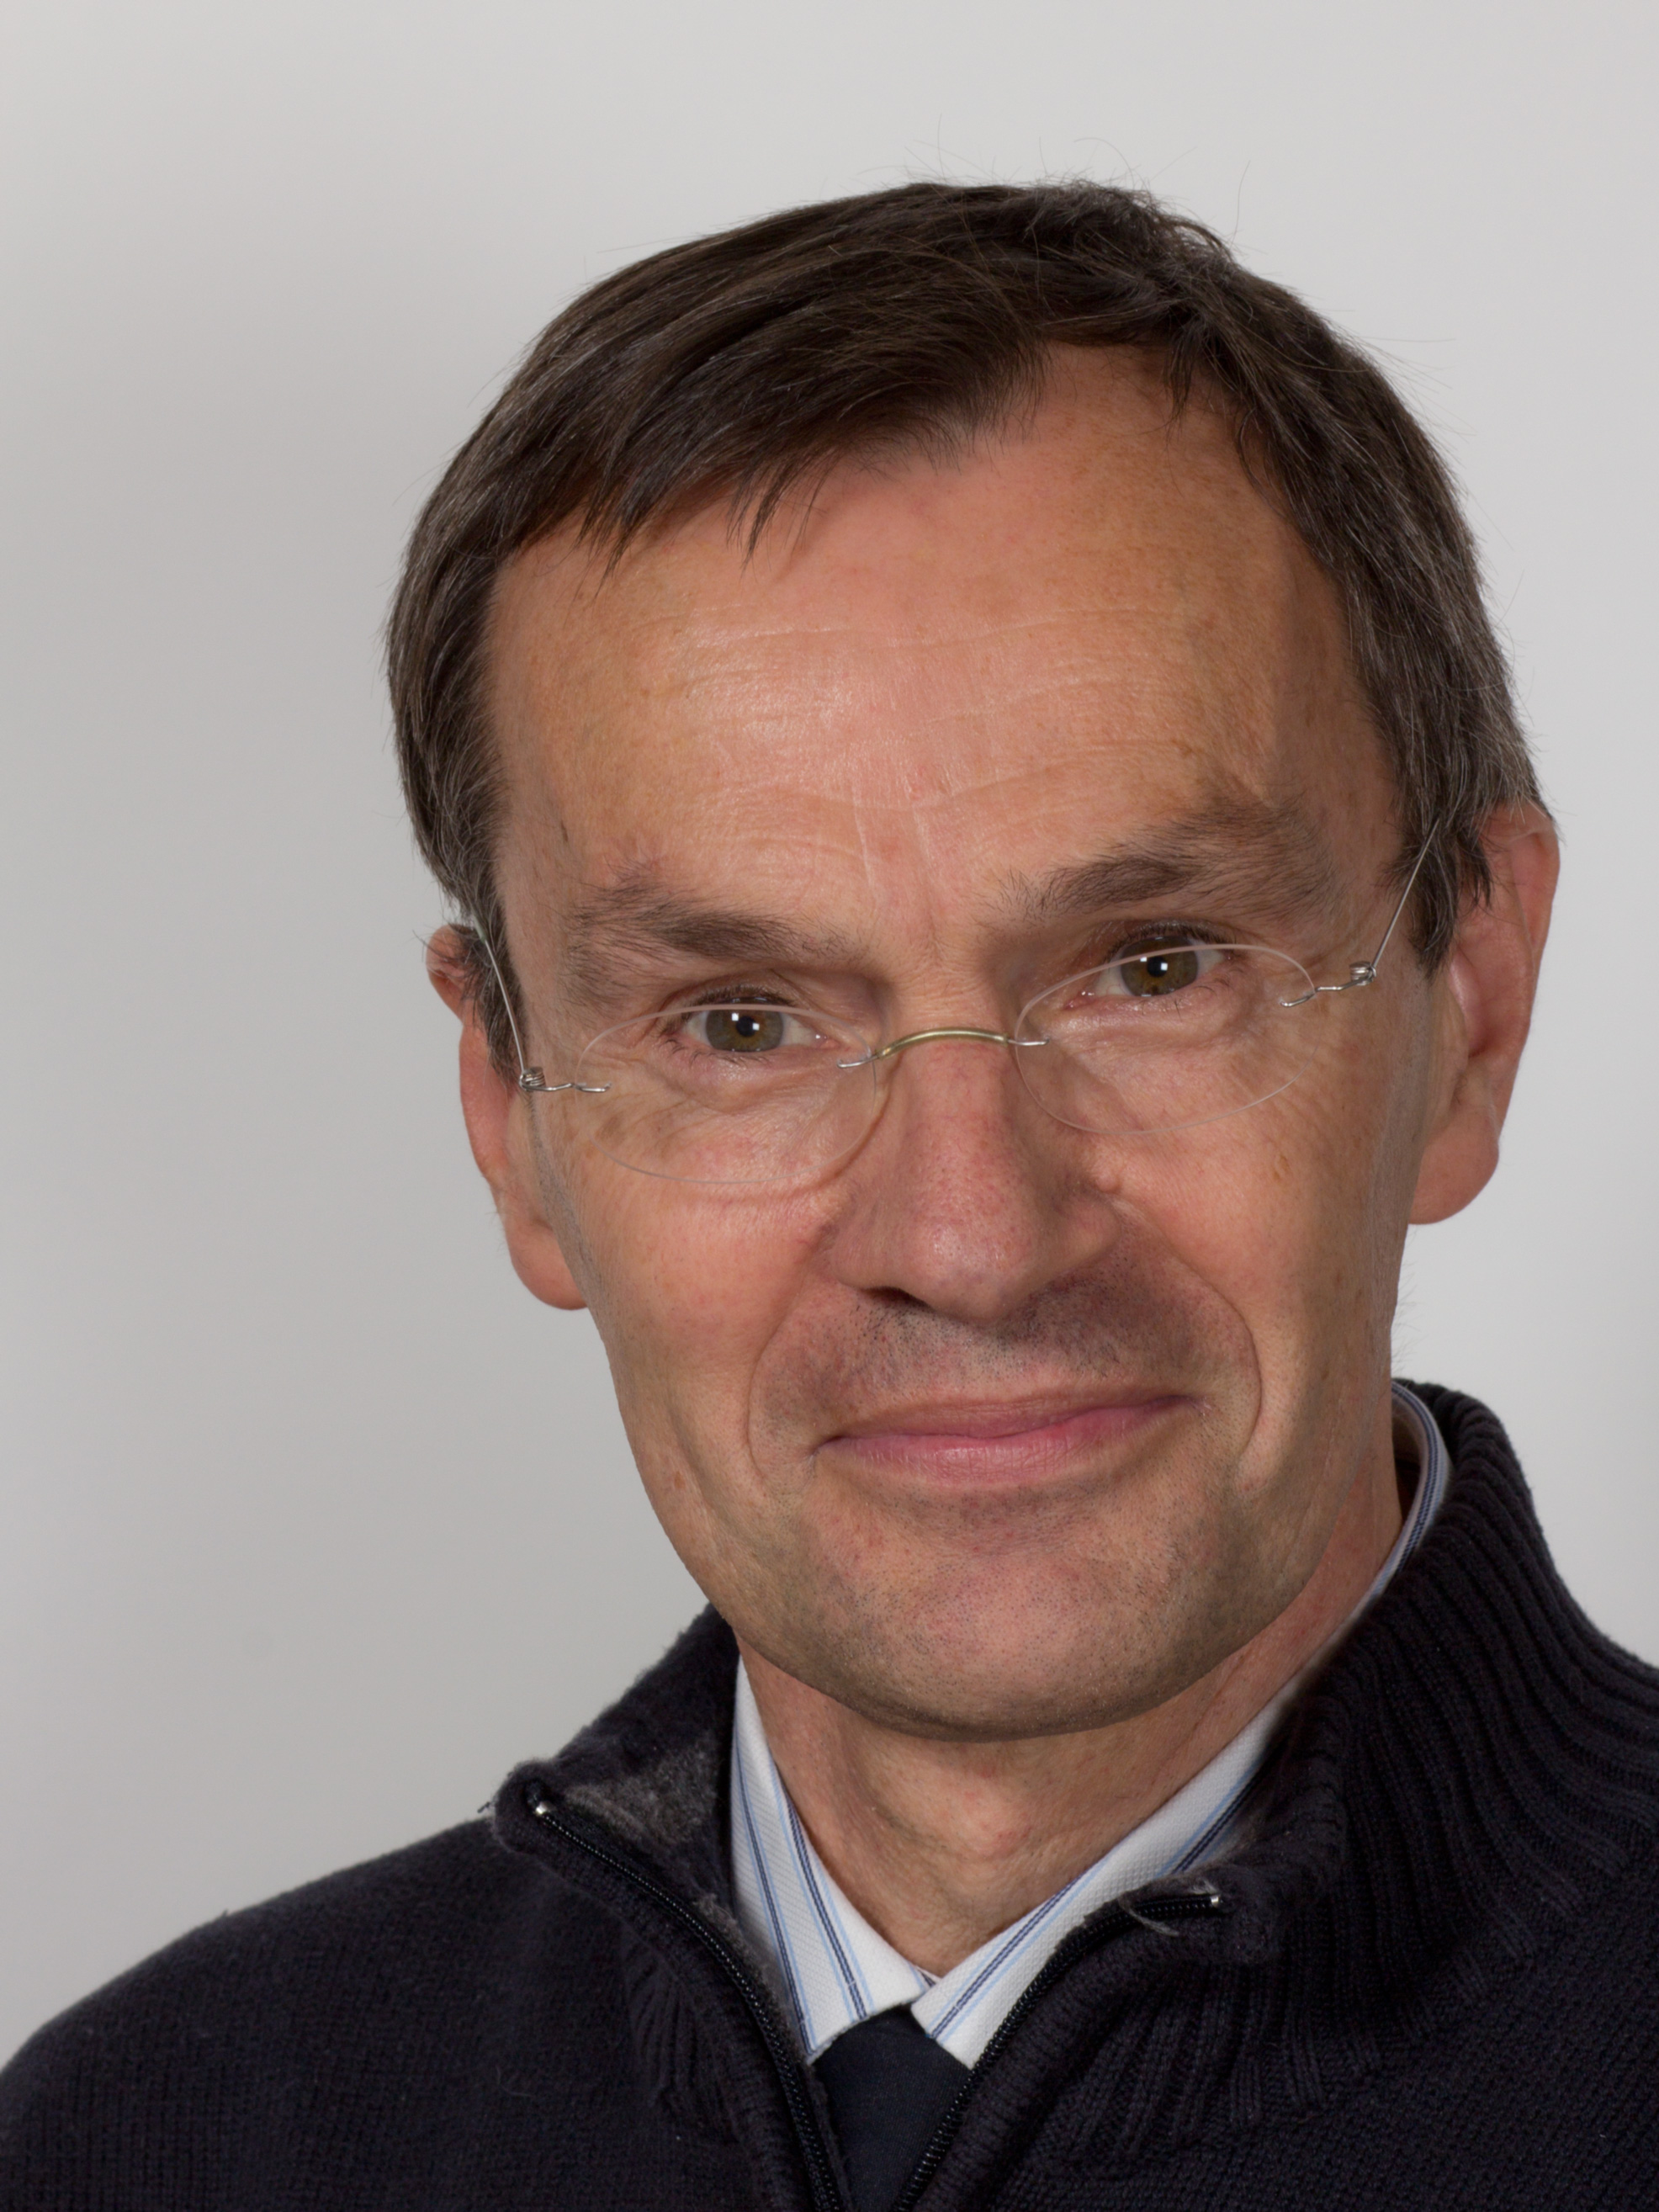 Wolfgang Killing in 2012